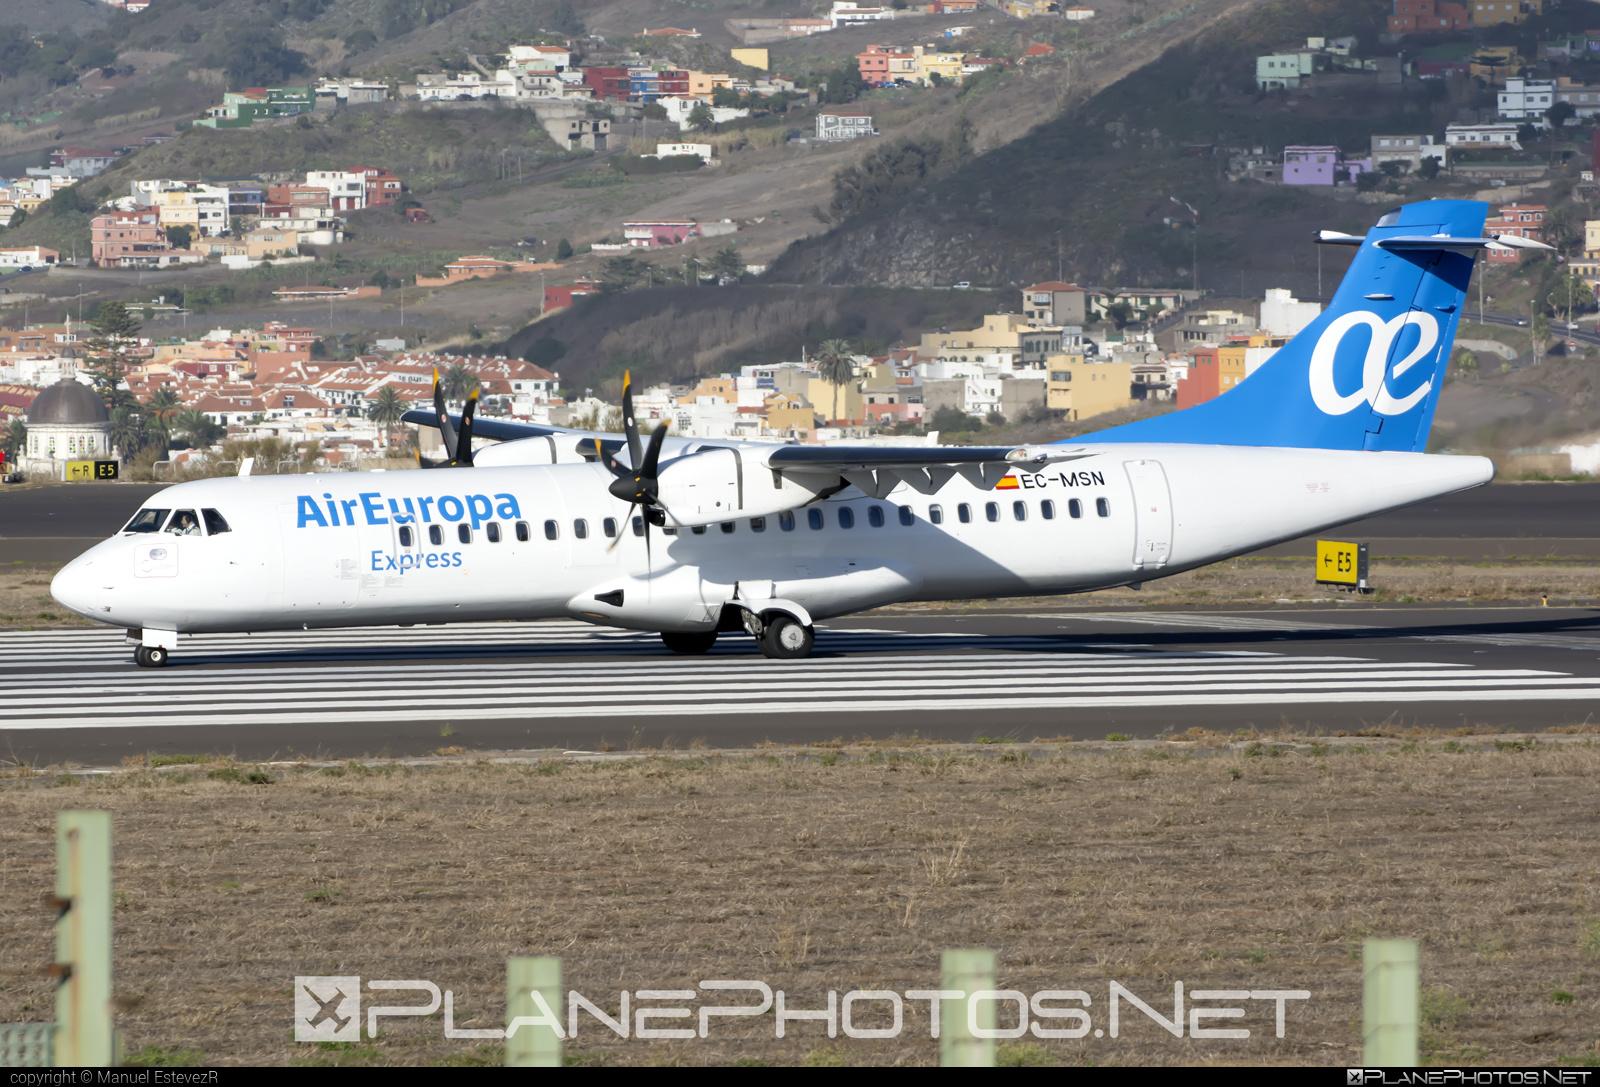 ATR 72-212A - EC-MSN operated by Air Europa Express #atr